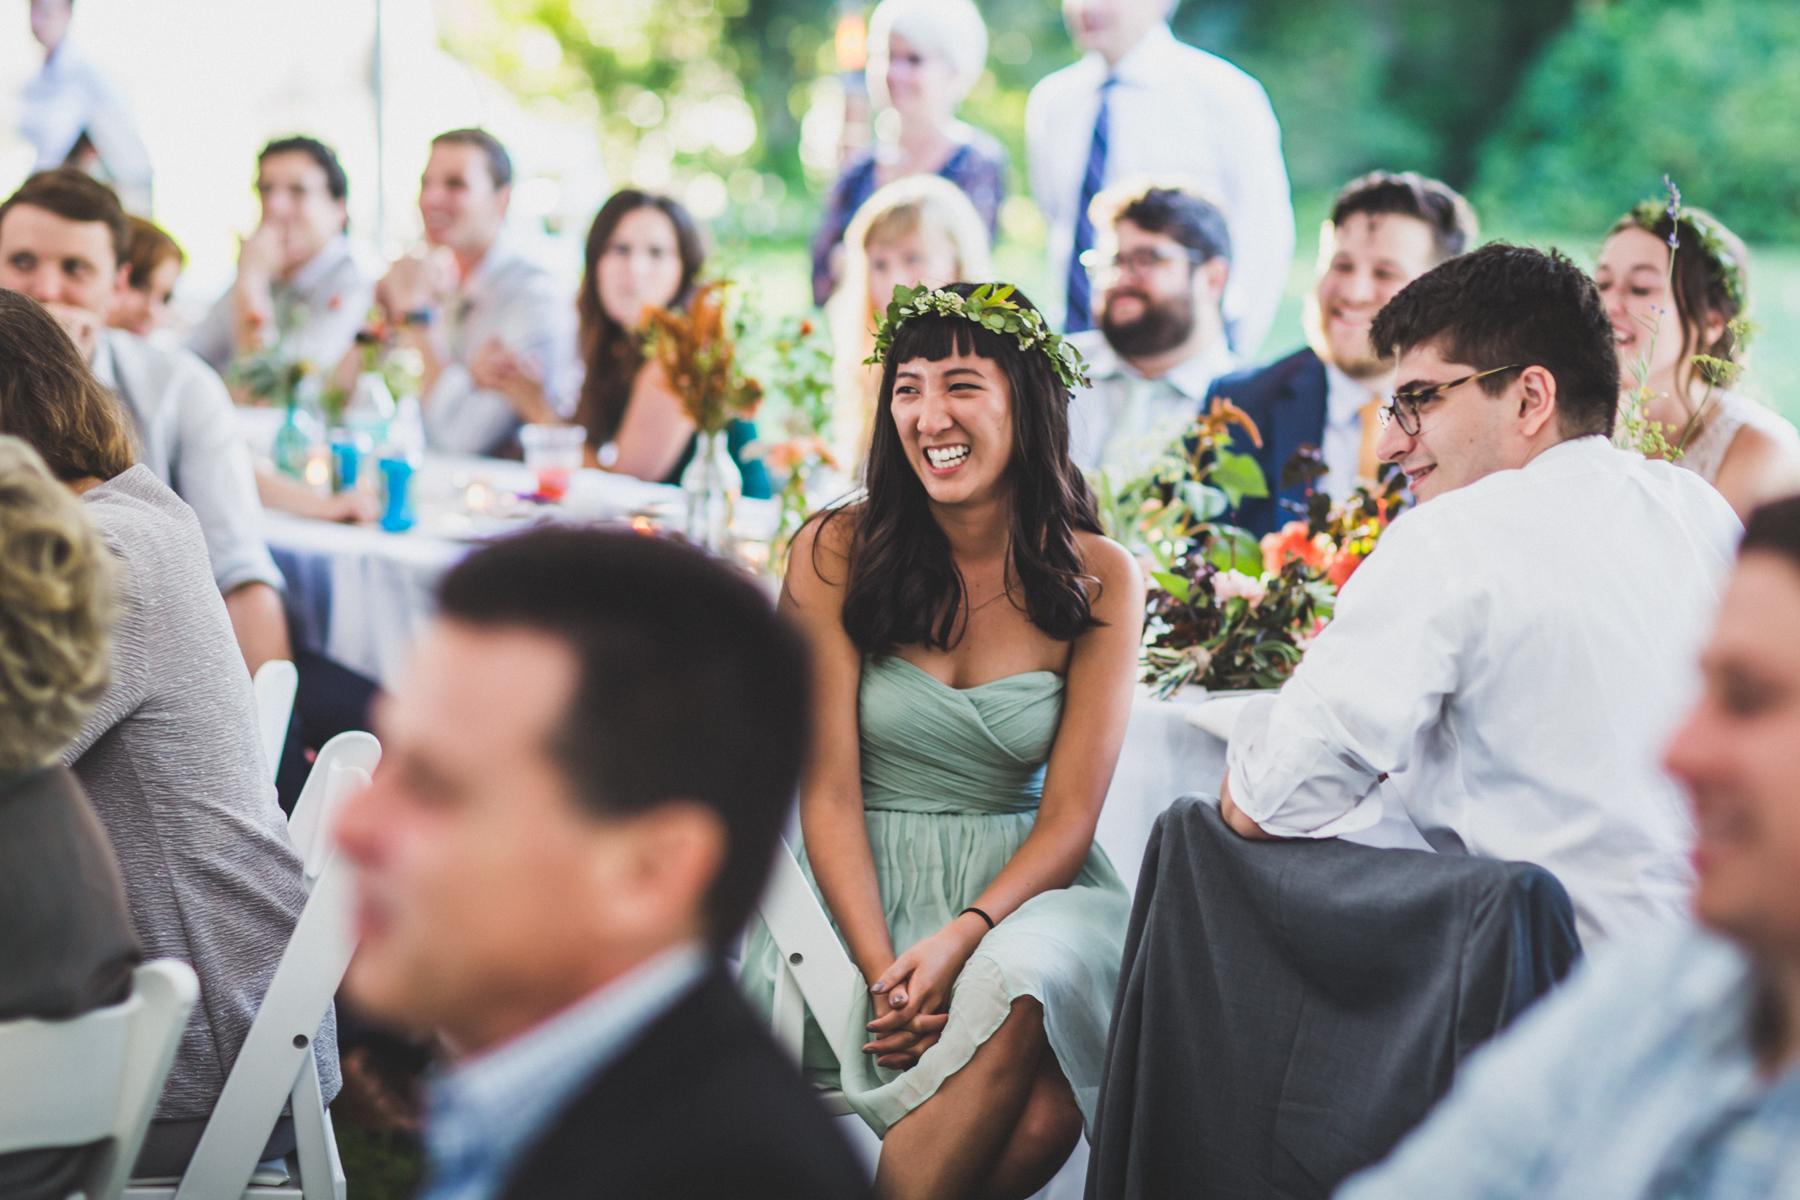 Long-Island-Documentary-Wedding-Photography-Summer-Tent-Wedding-in-New-York-125.jpg